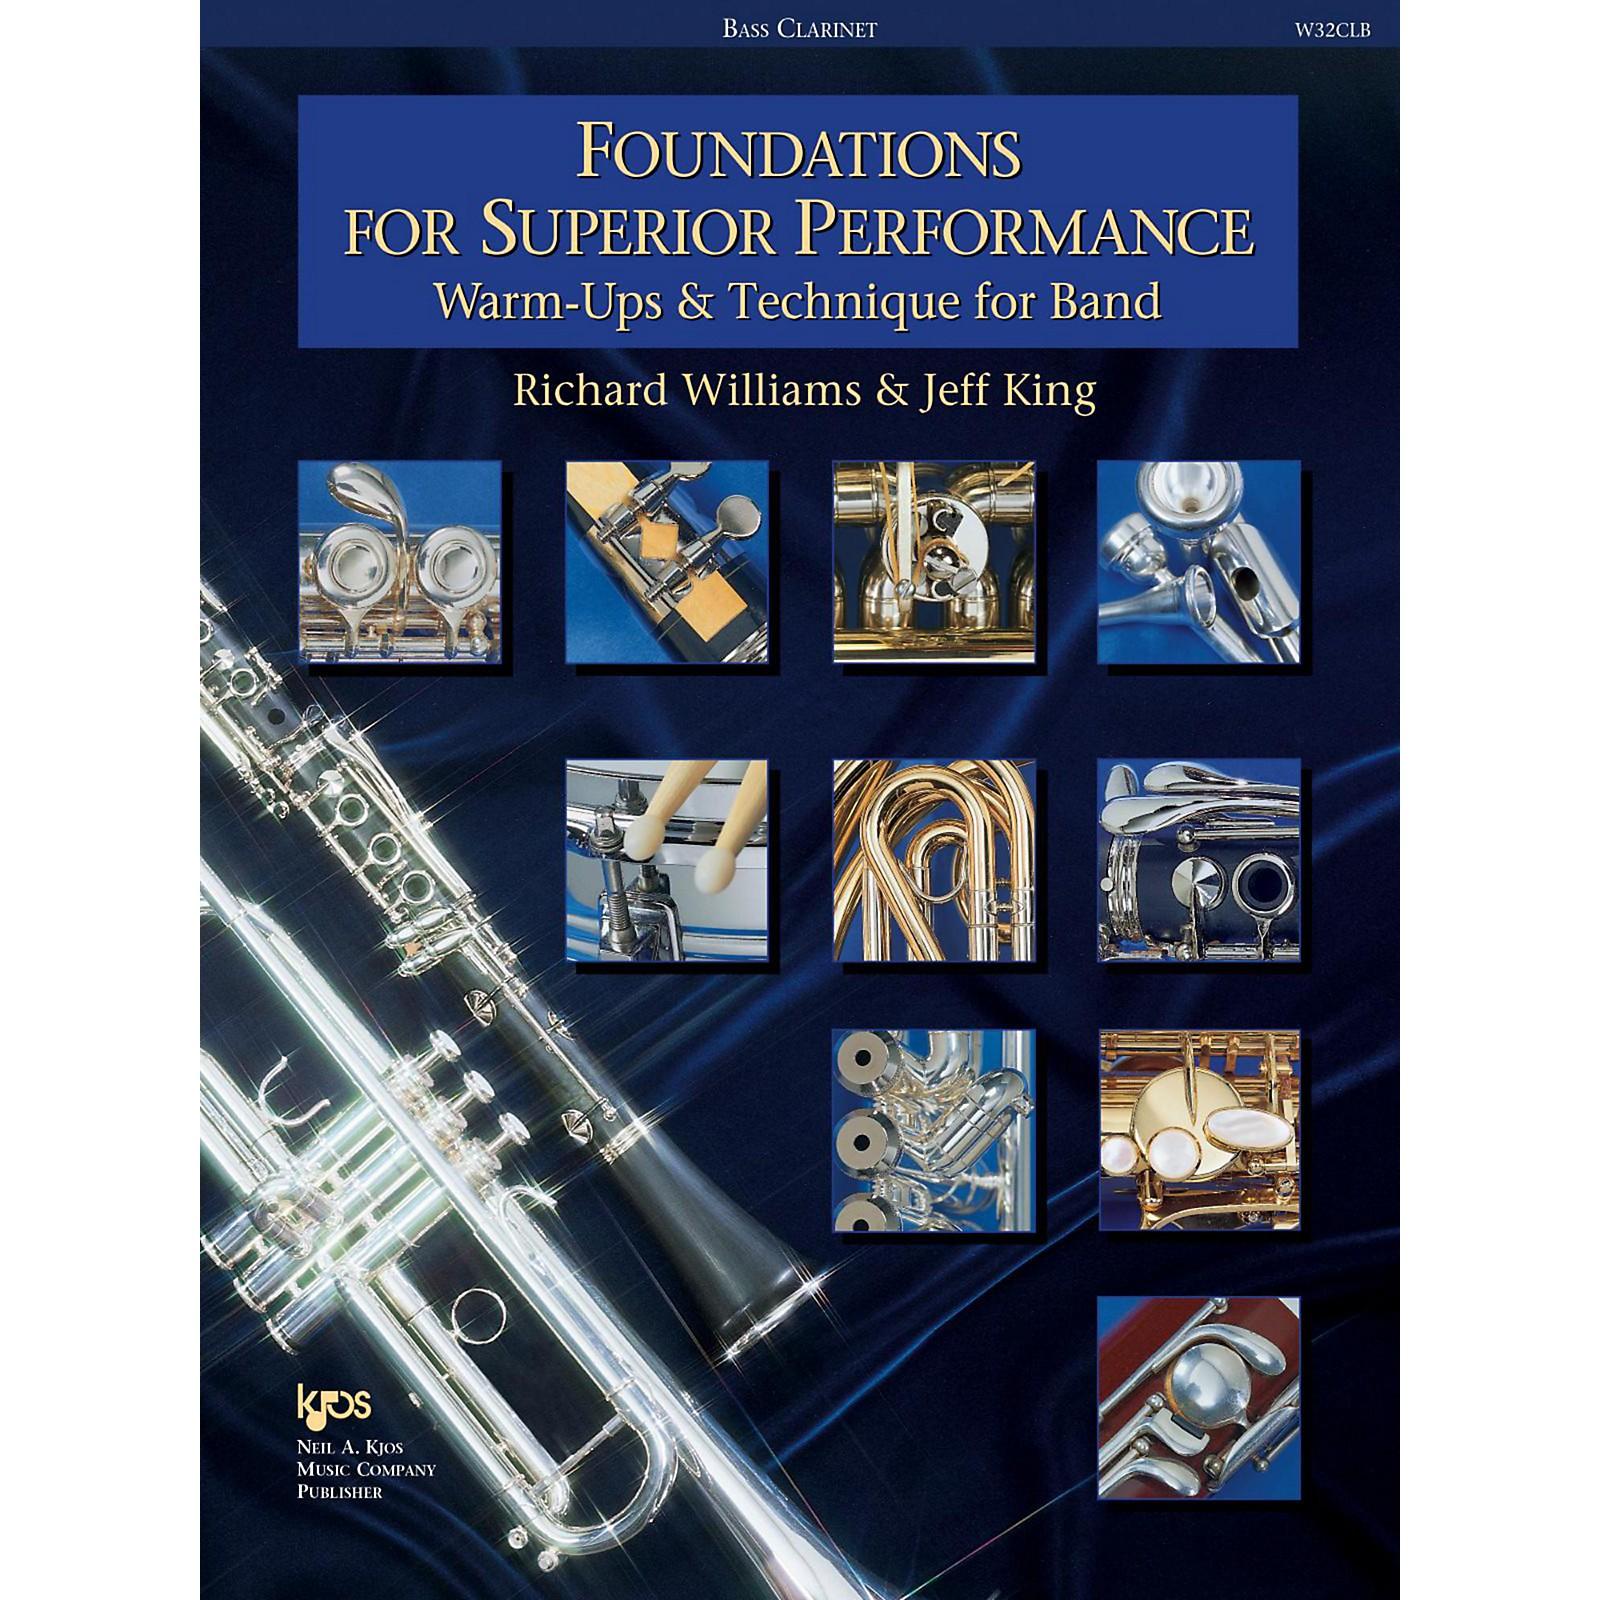 KJOS Foundations for Superior Performance Bass Clarinet